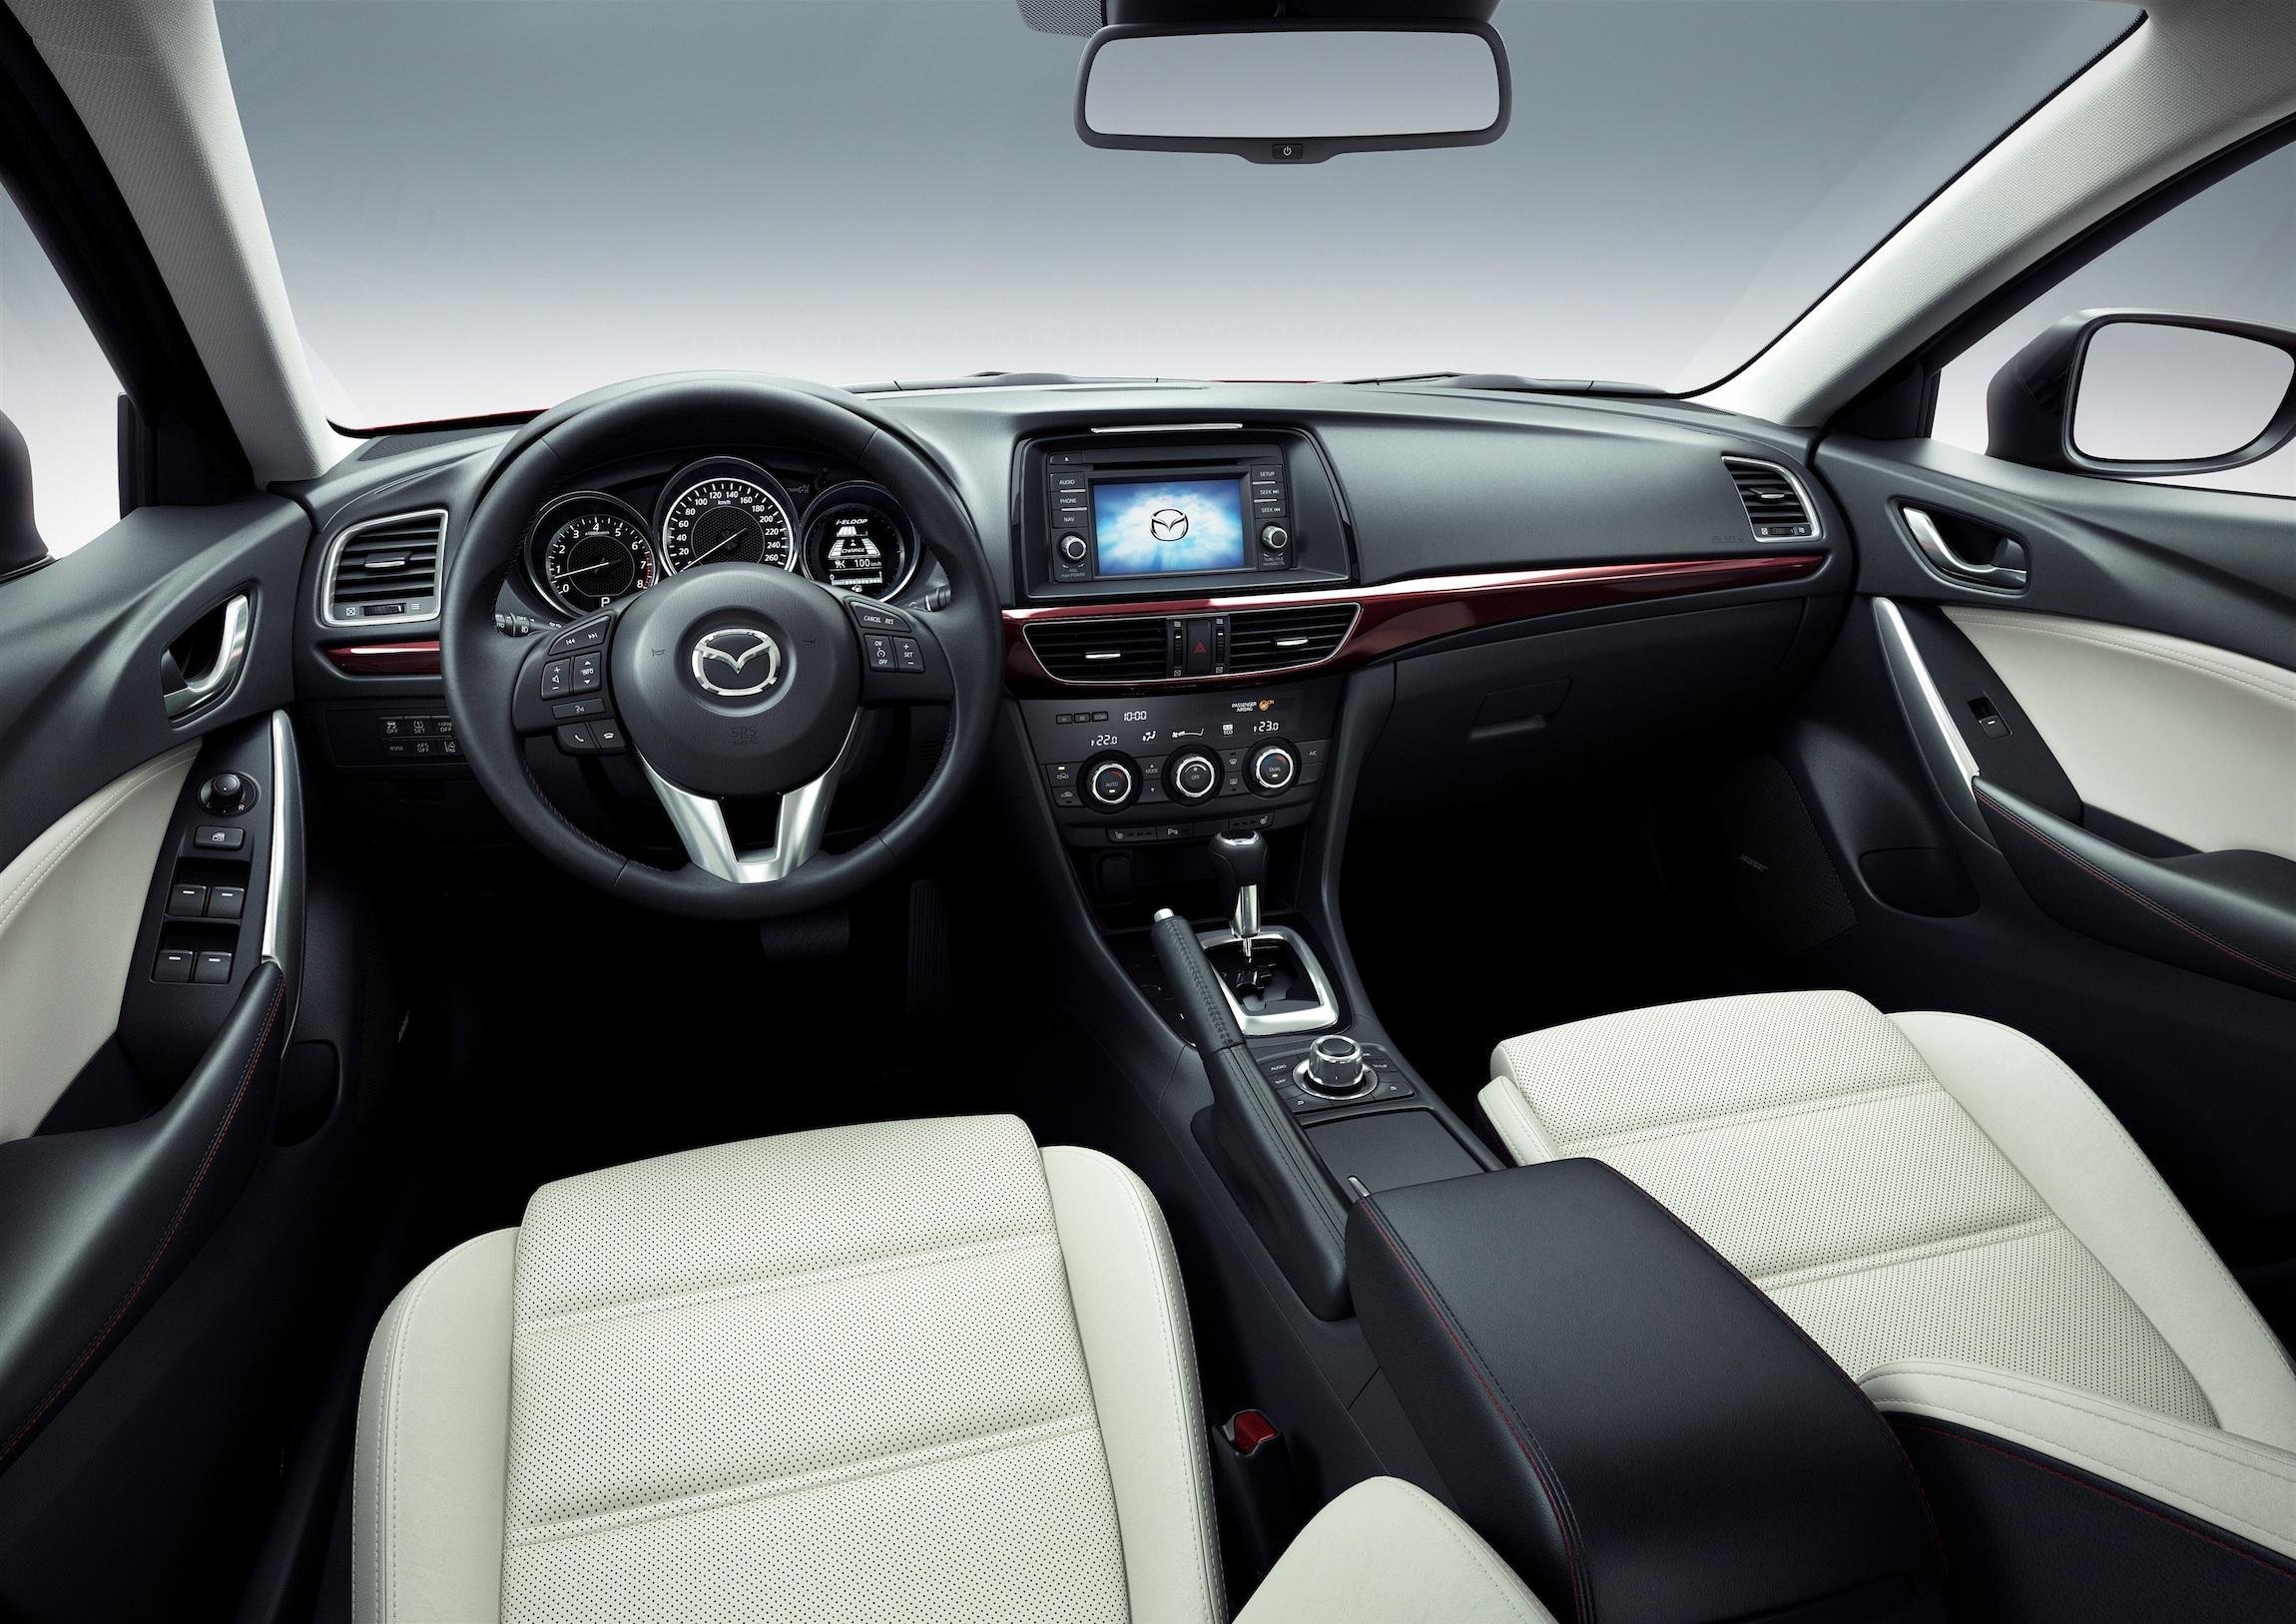 2014 Mazda6 Wagon Rolls Off Assembly Line - Video » AutoGuide.com News